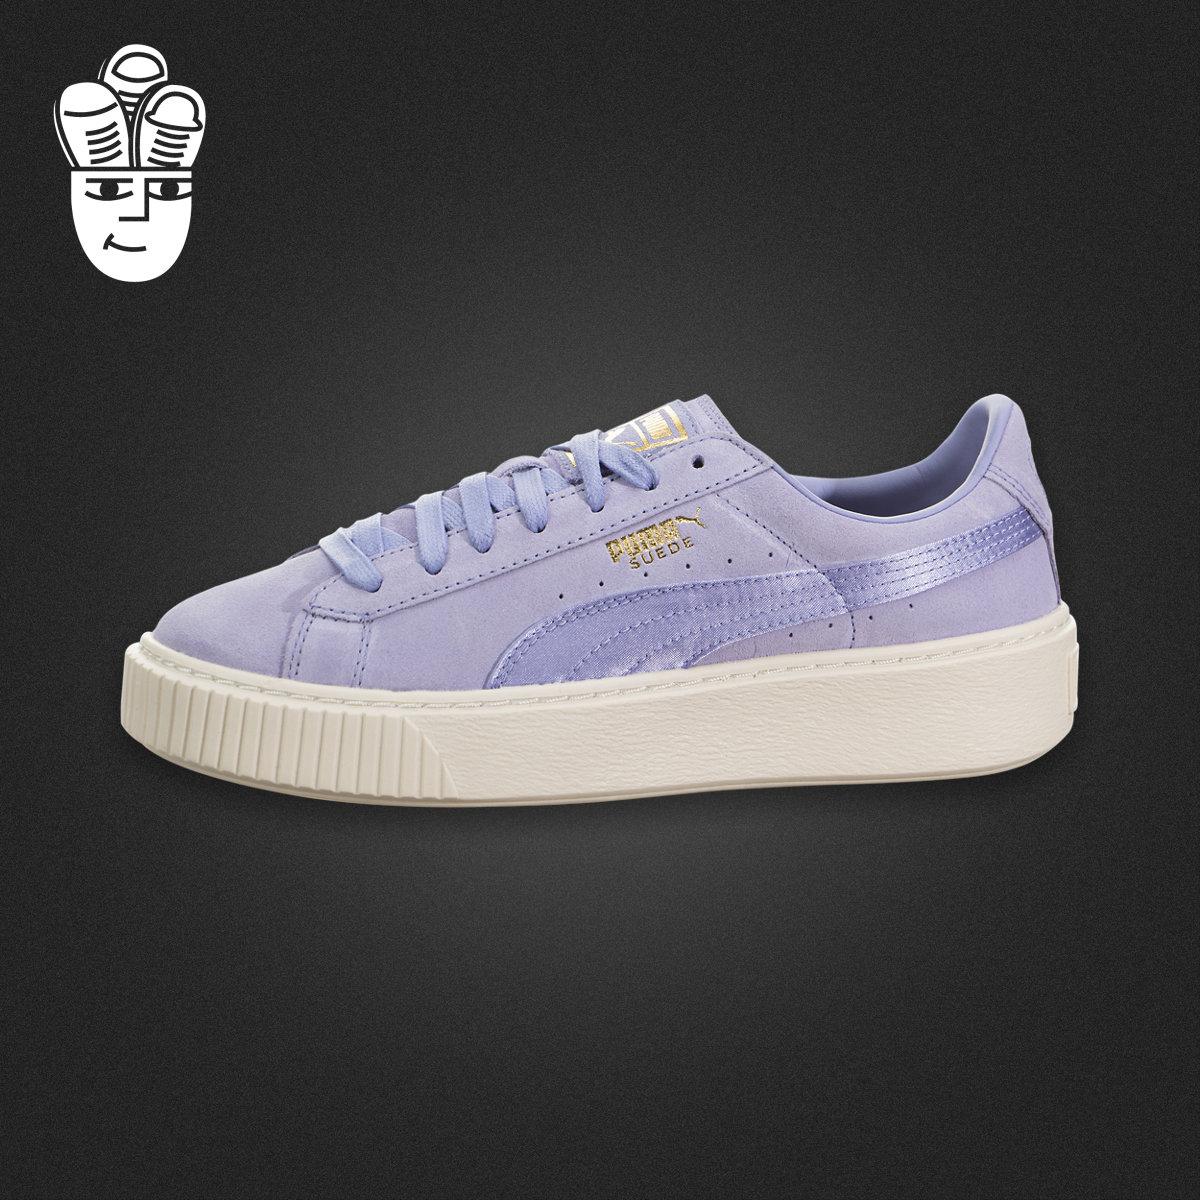 Puma Suede Platform 彪马女鞋 厚底松糕鞋 休闲鞋 蕾哈娜同款